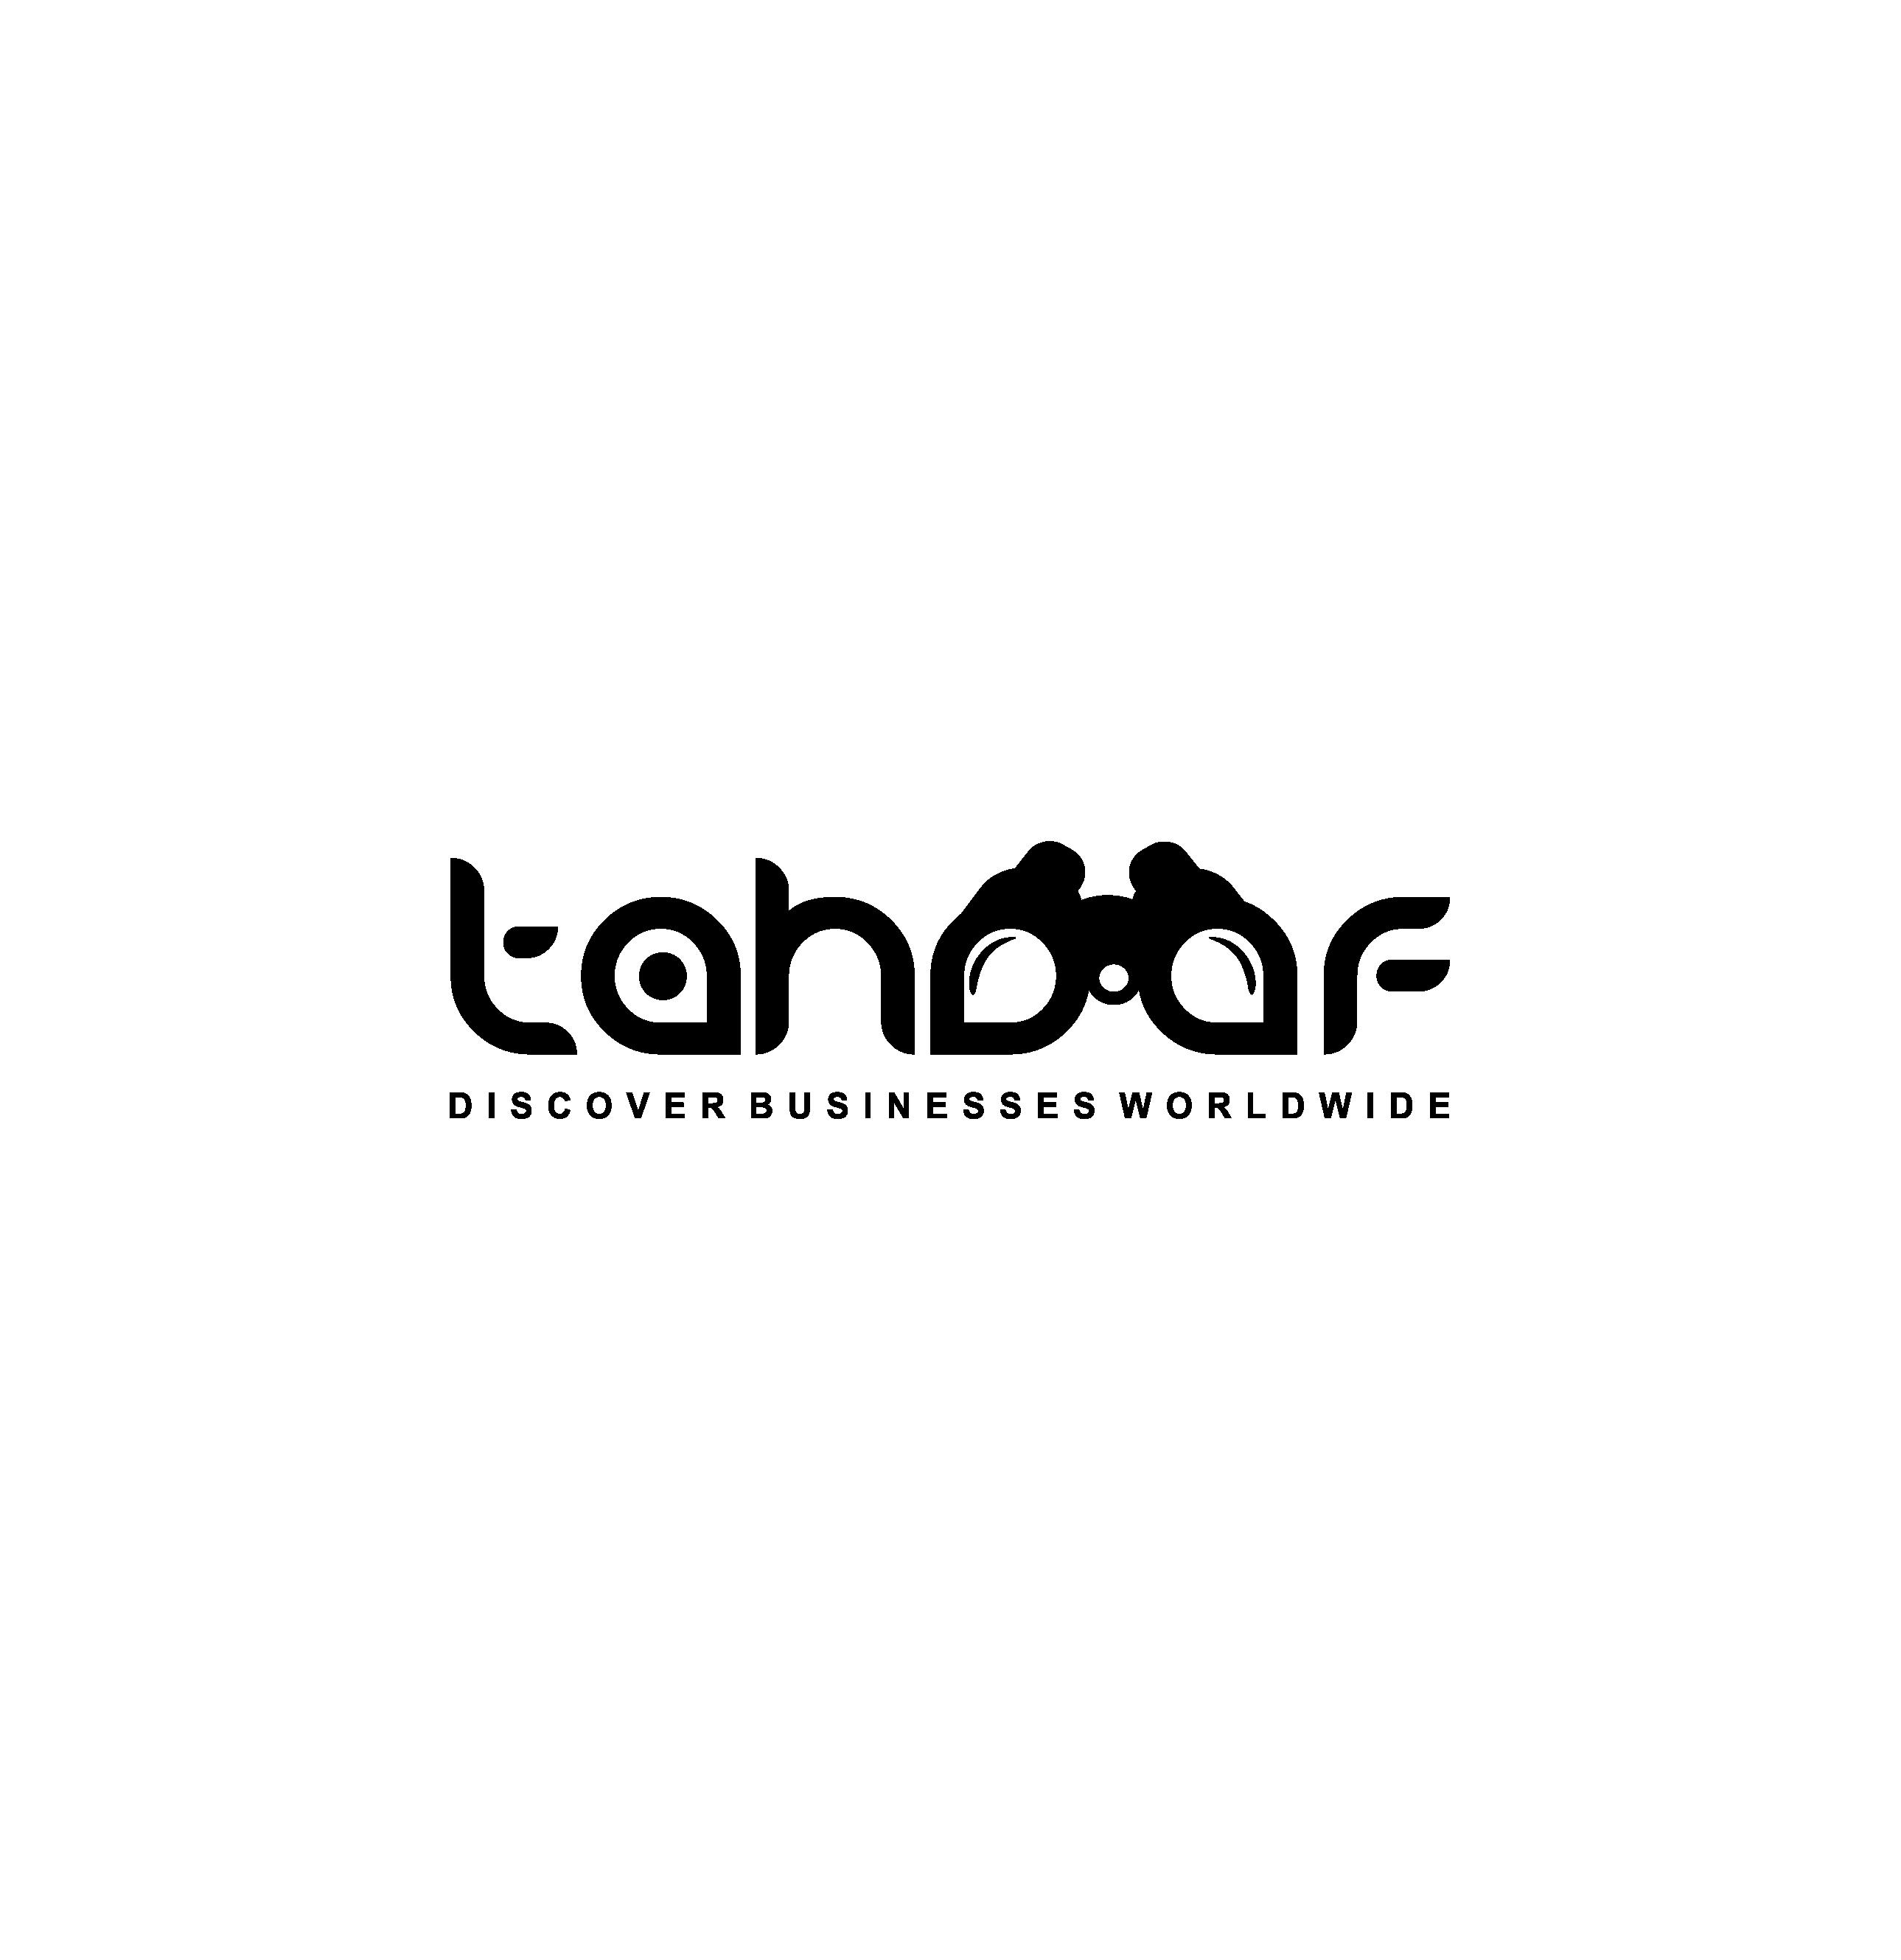 TAHDAF Needs a New Logo